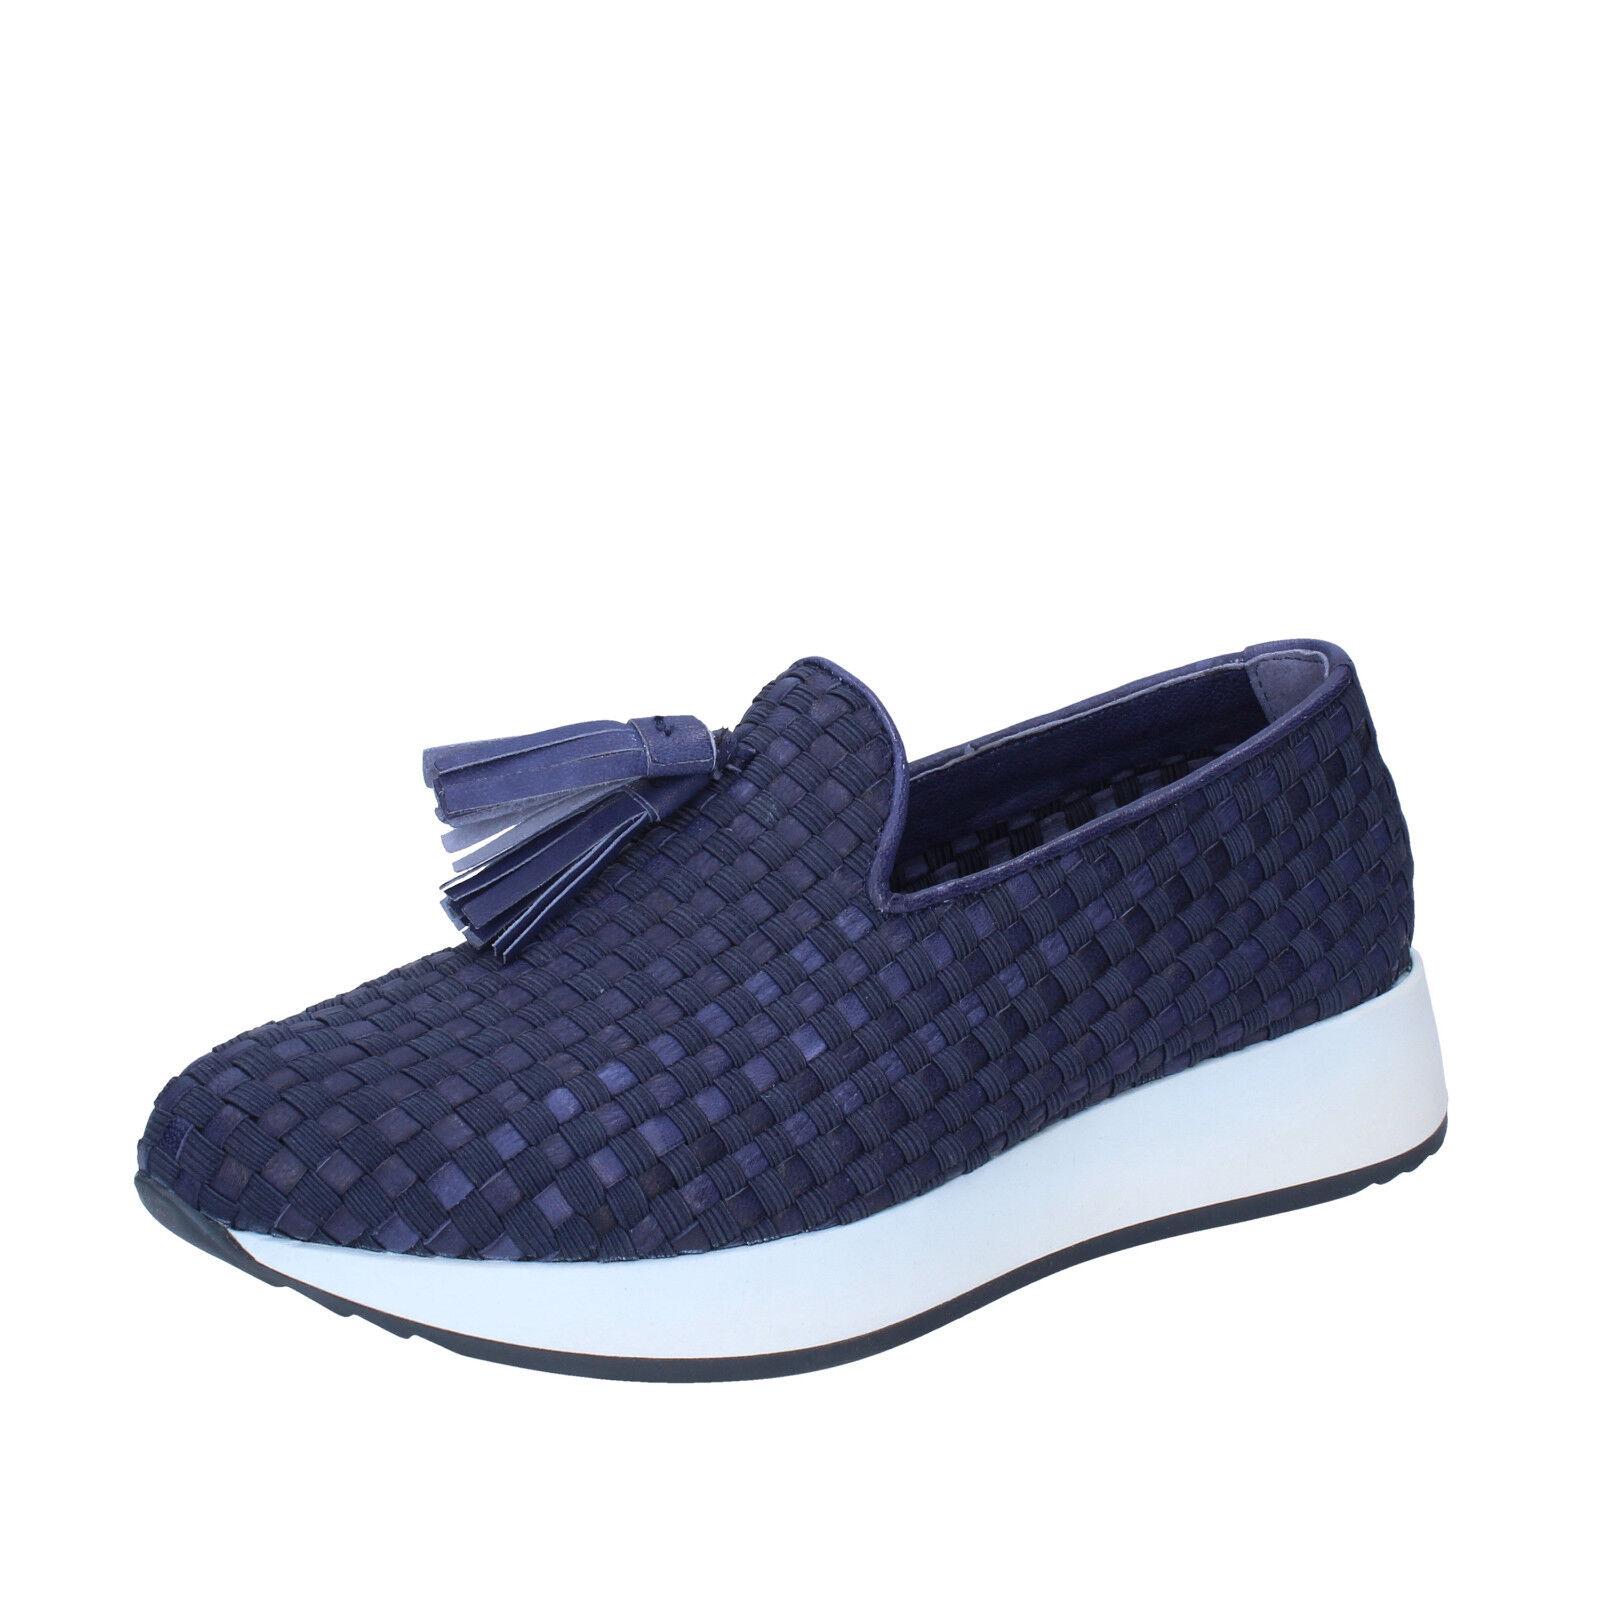 Zapatos señora emanuelle Vee 39 UE slip on azul textil, textil, textil, cuero bs22-39  hasta 42% de descuento